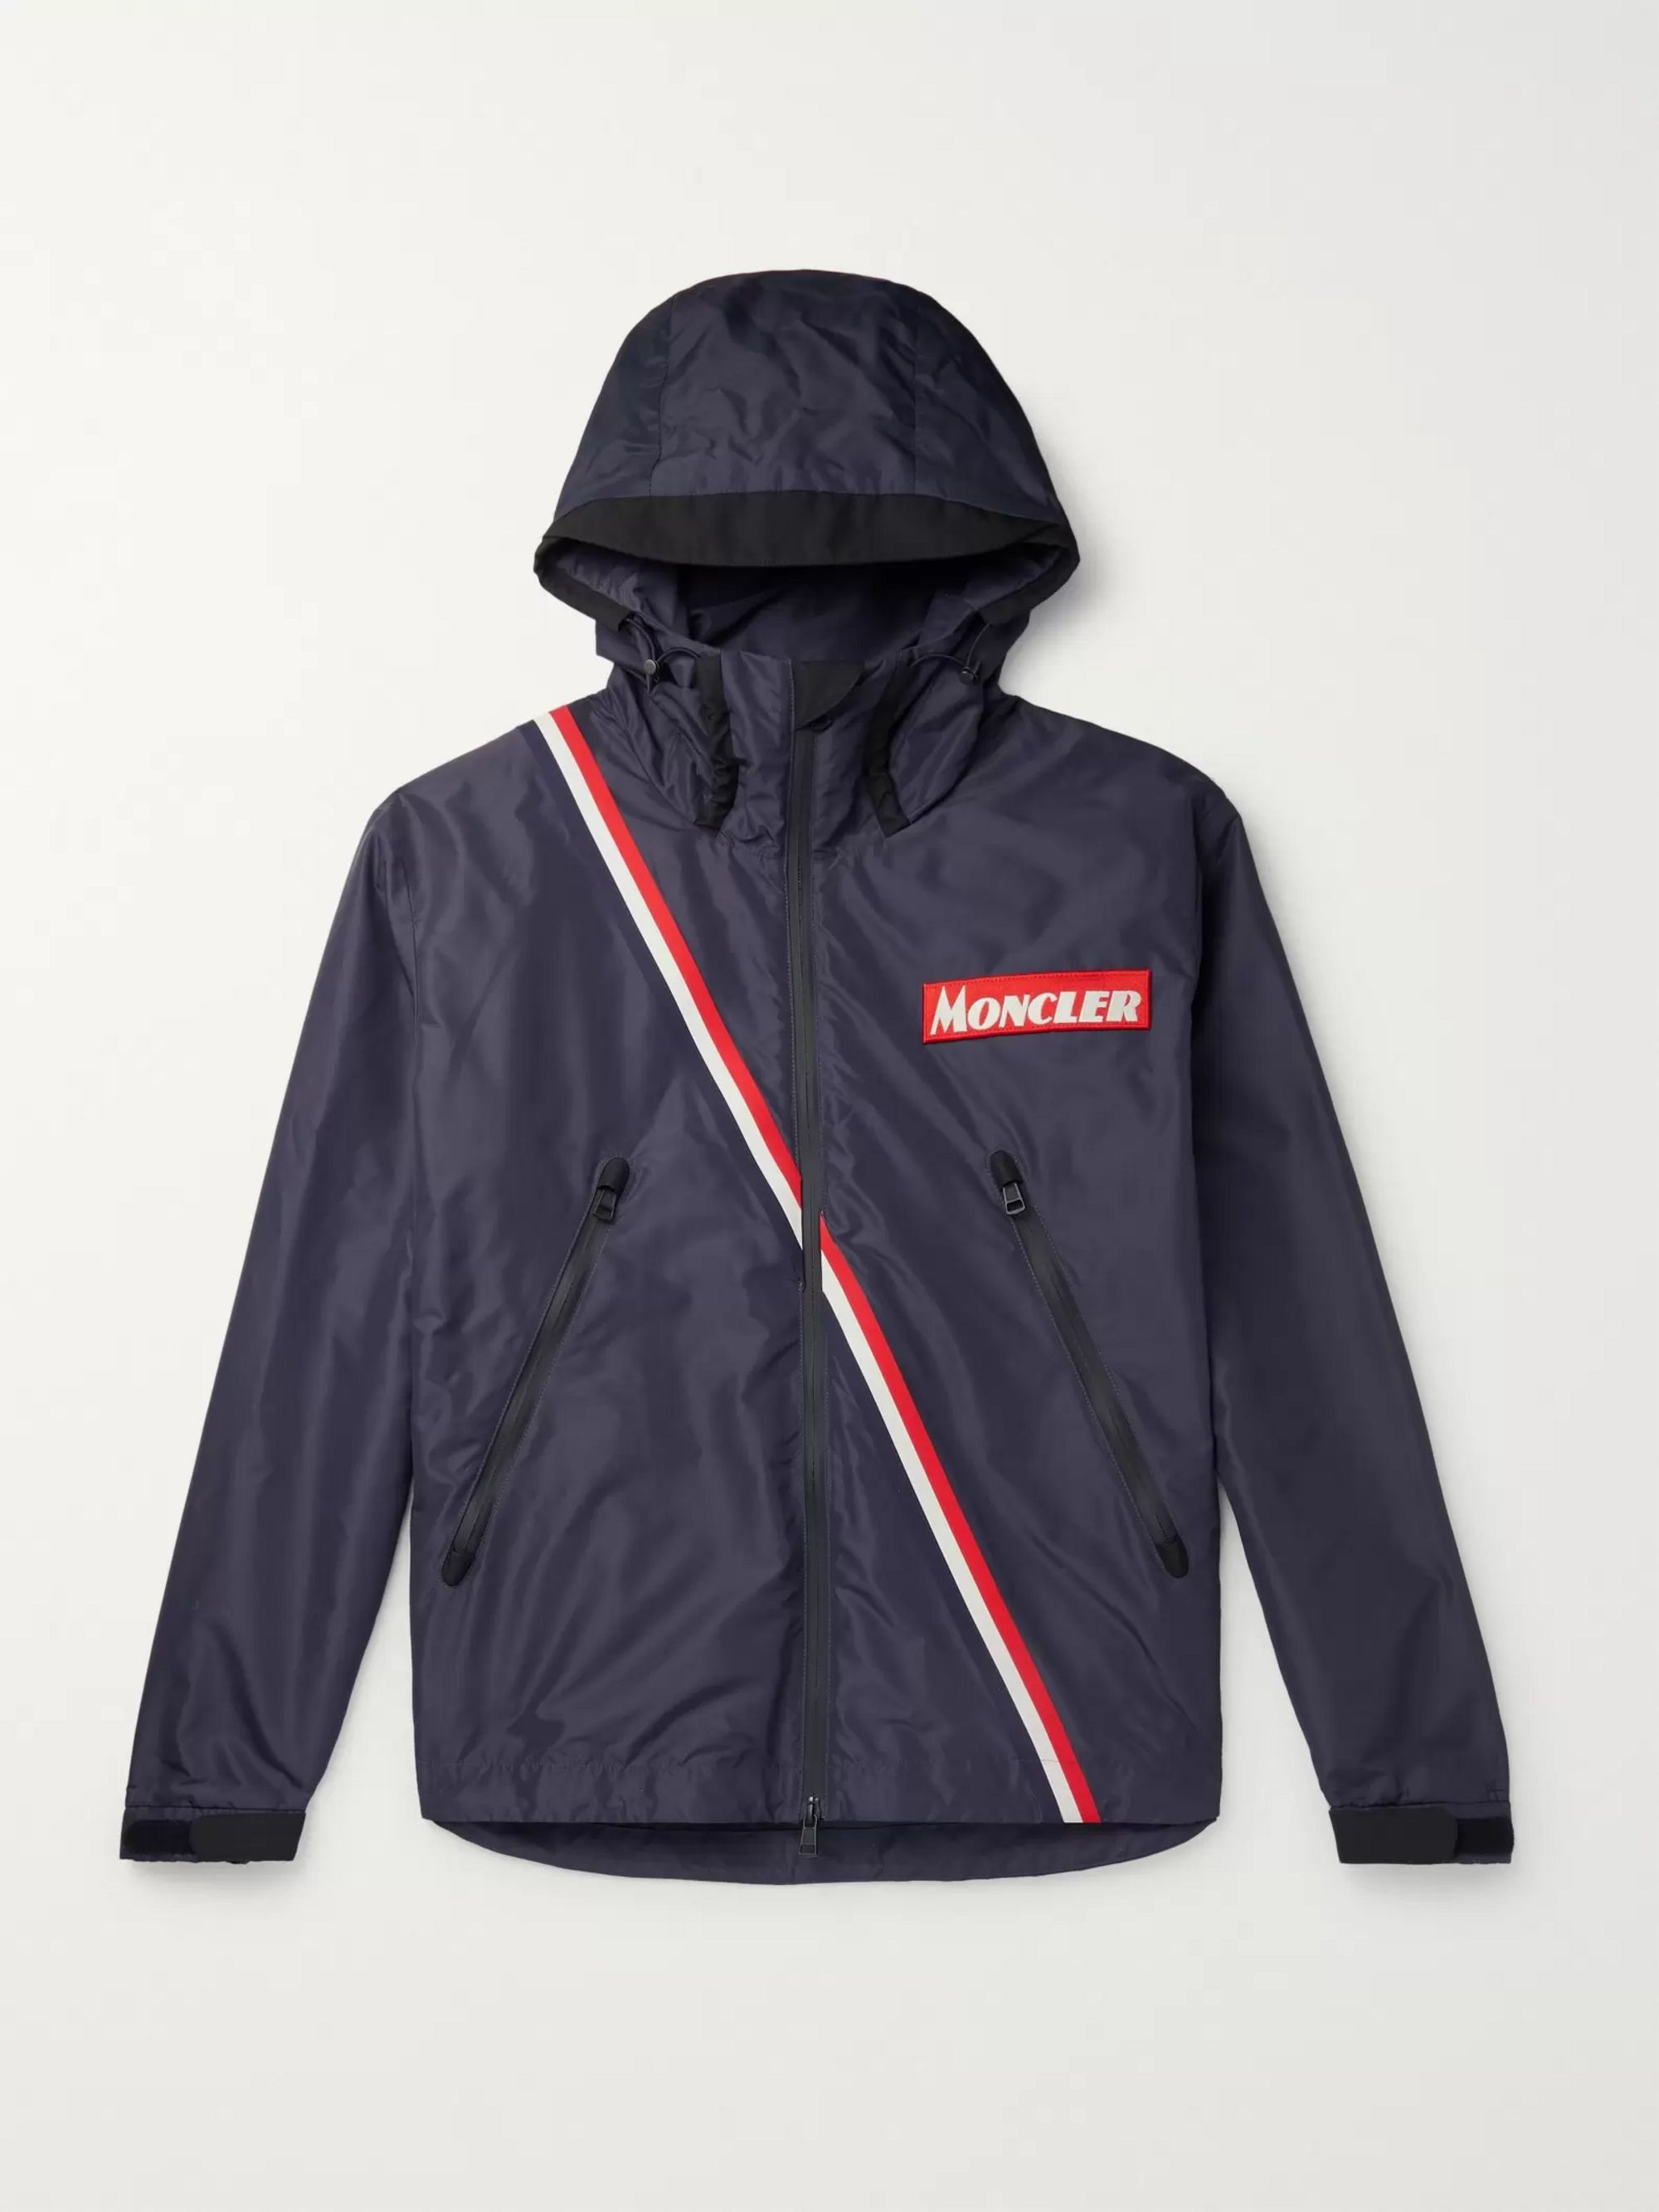 Trakehner Striped Nylon Hooded Jacket by Moncler